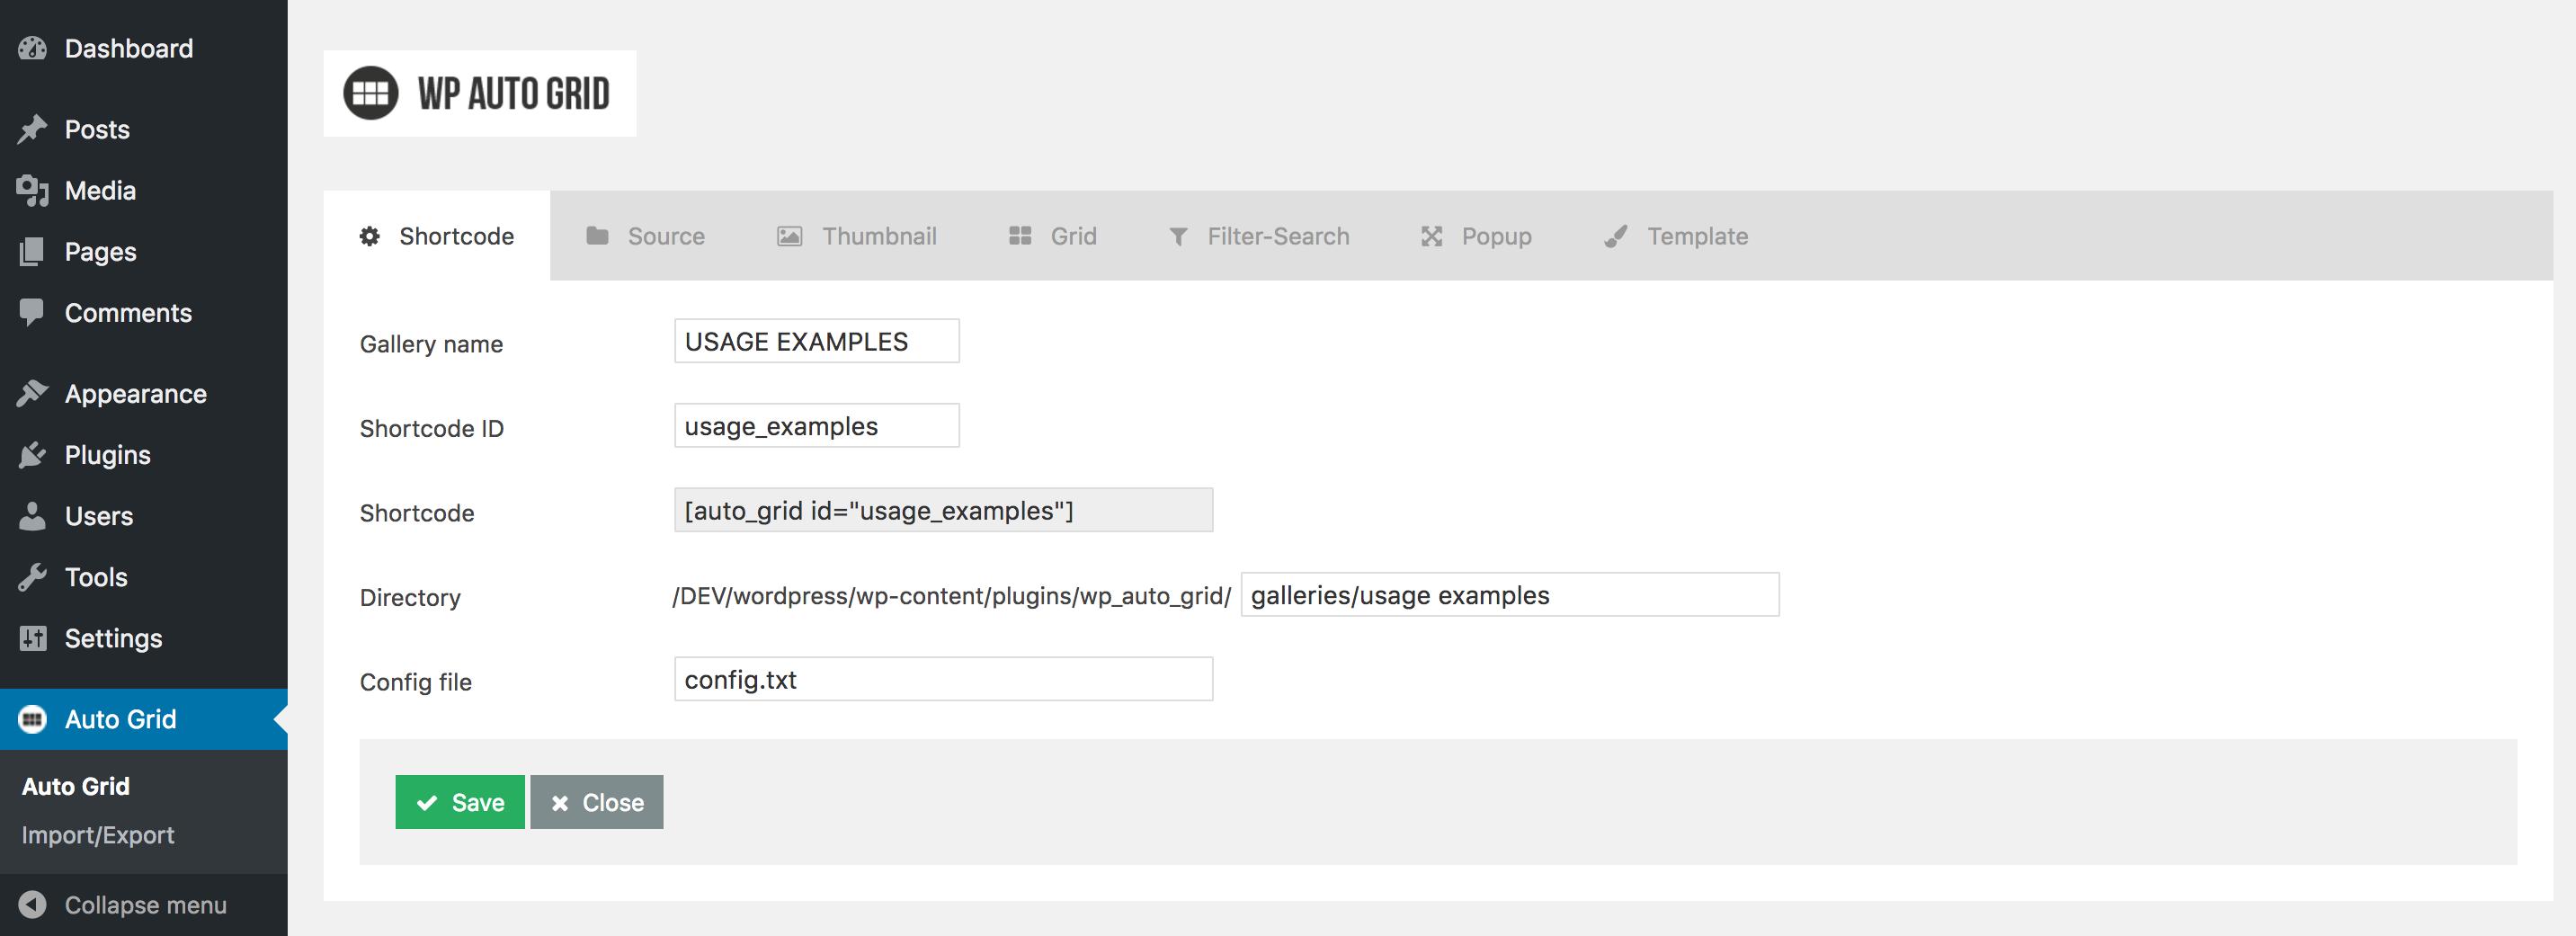 Auto Grid Responsive Gallery - WordPress - 2